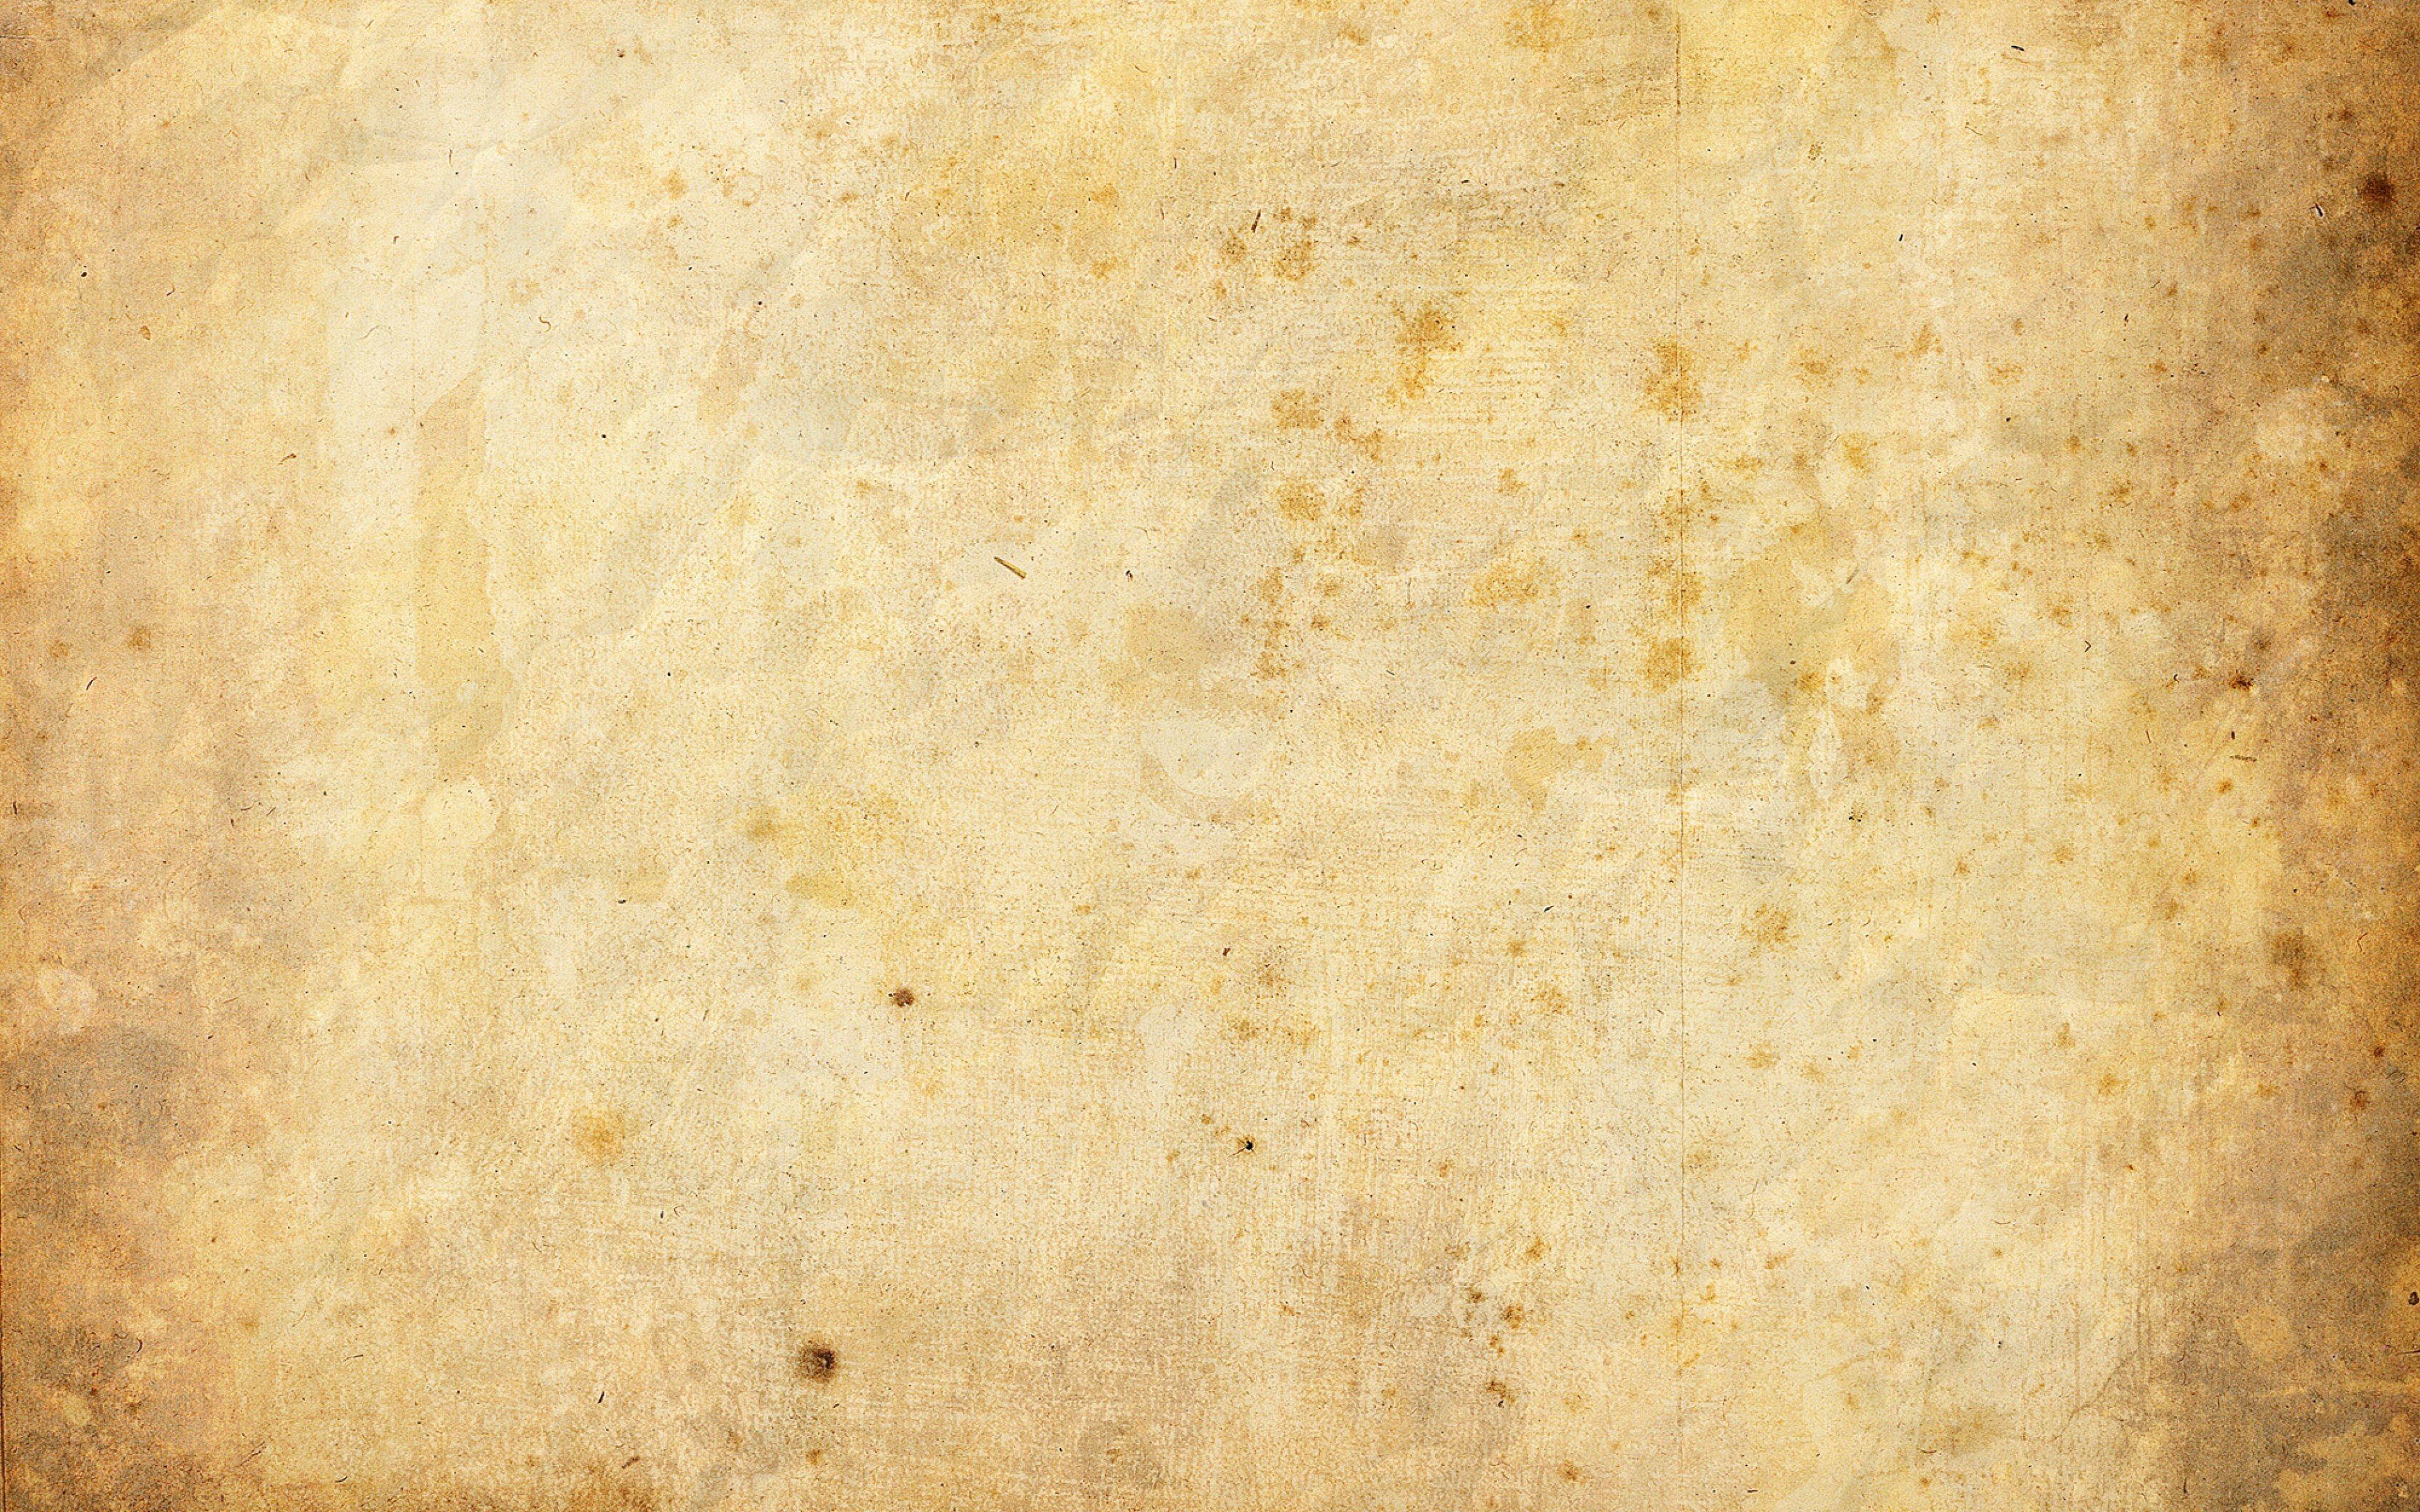 Download Wallpaper 3840x2400 Texture Paper Stains Old Ultra Hd 4k Hd Background Papel Envelhecido Papel De Fundo Jornal Wallpaper